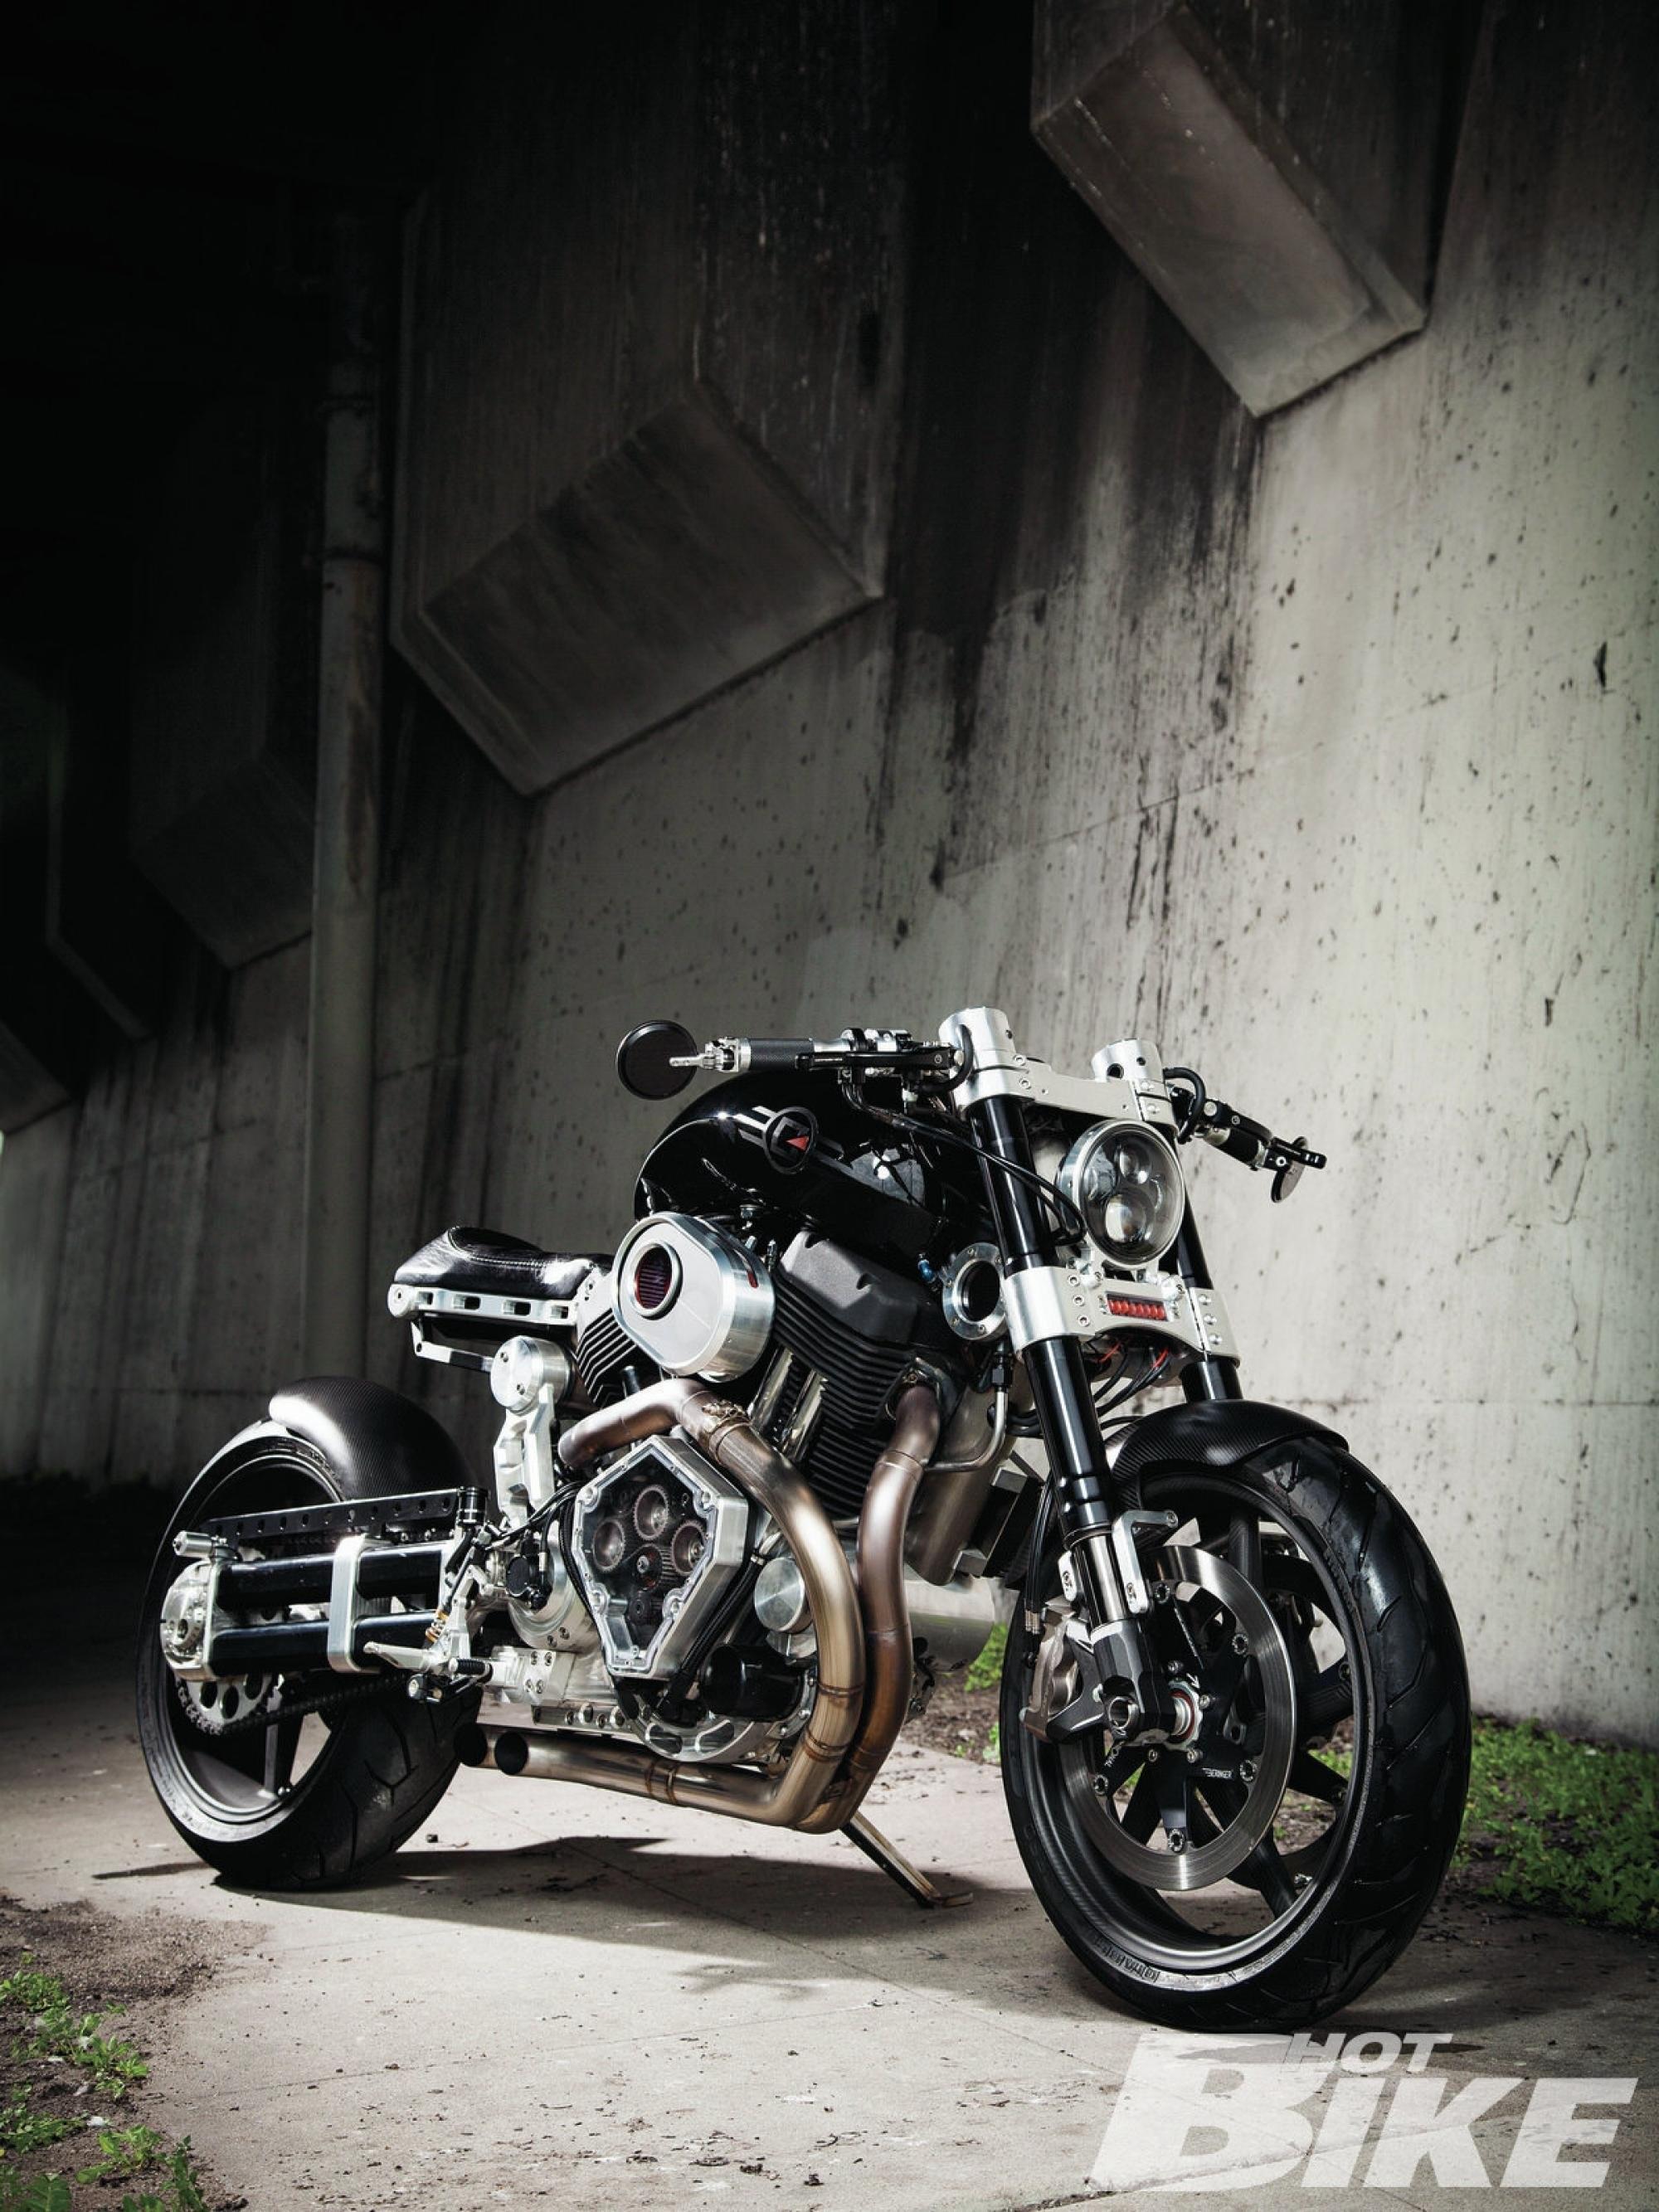 CONFEDERATE MOTORCYCLE superbike custom bike motorbike race racing hot rod  rods speedster cafe racer wallpaper     742651   WallpaperUP